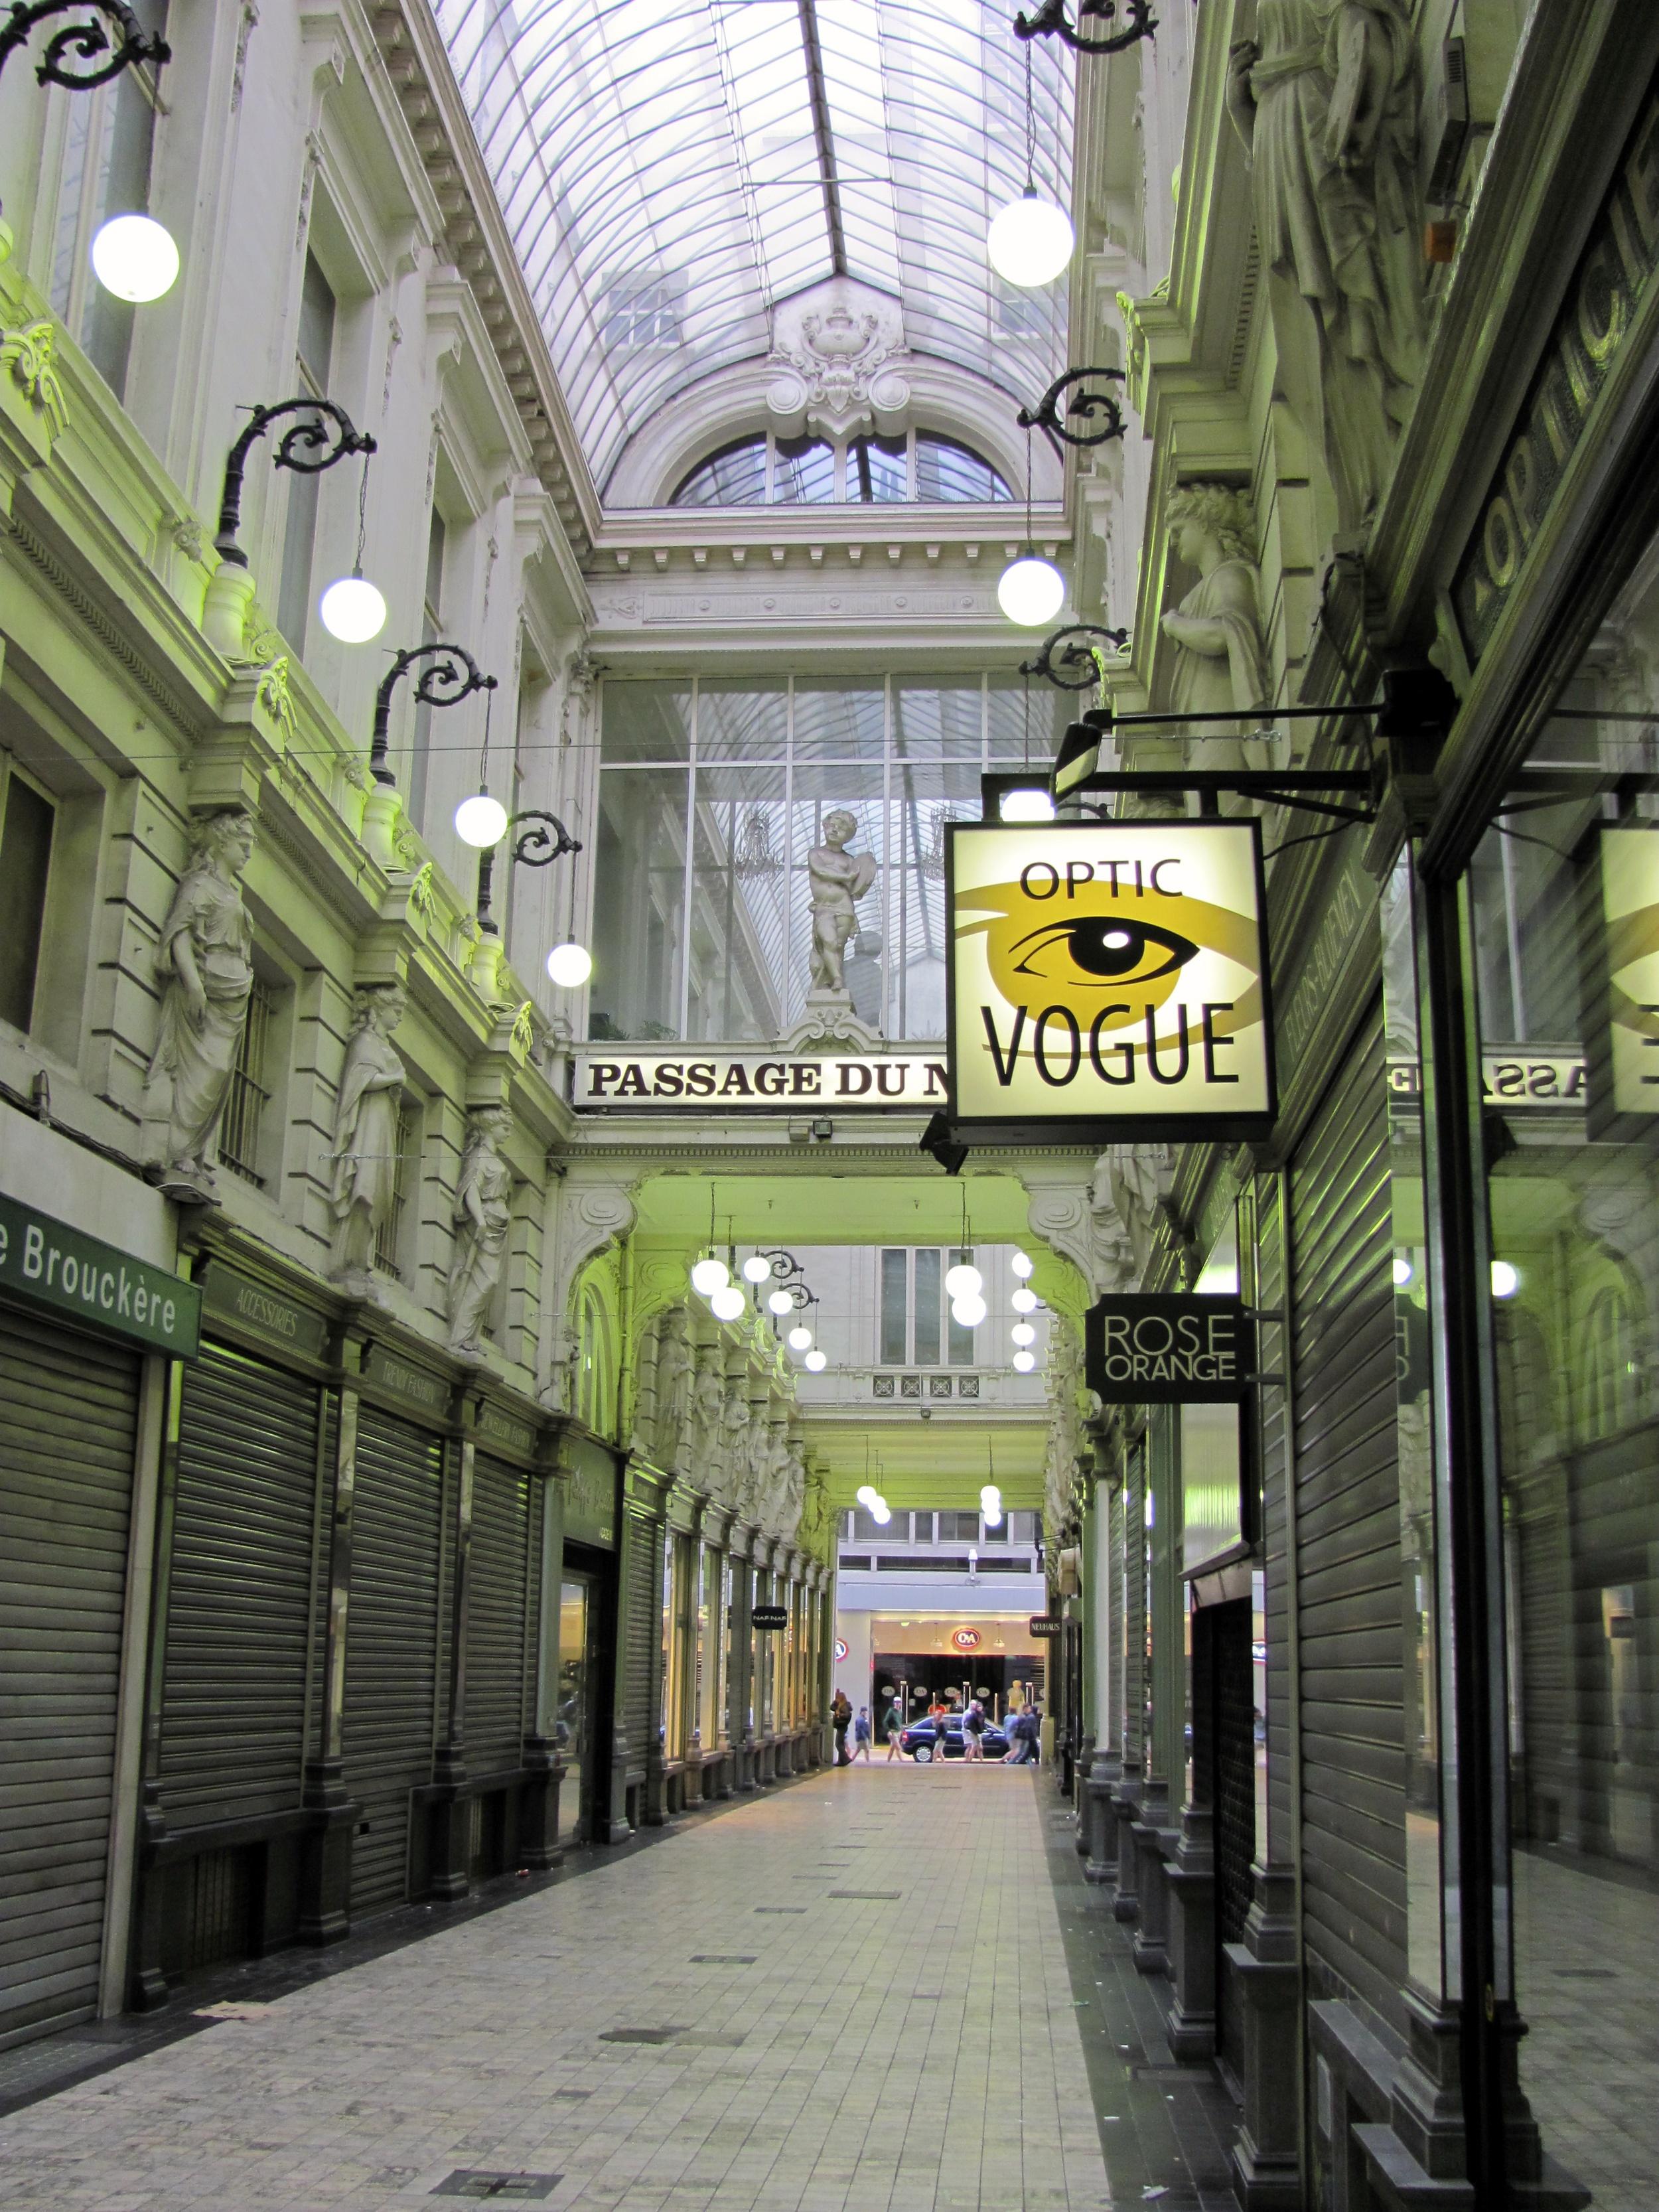 Passage du Neuhaus, off Rue Neuve, Brussels, Belgium, VHS 2010